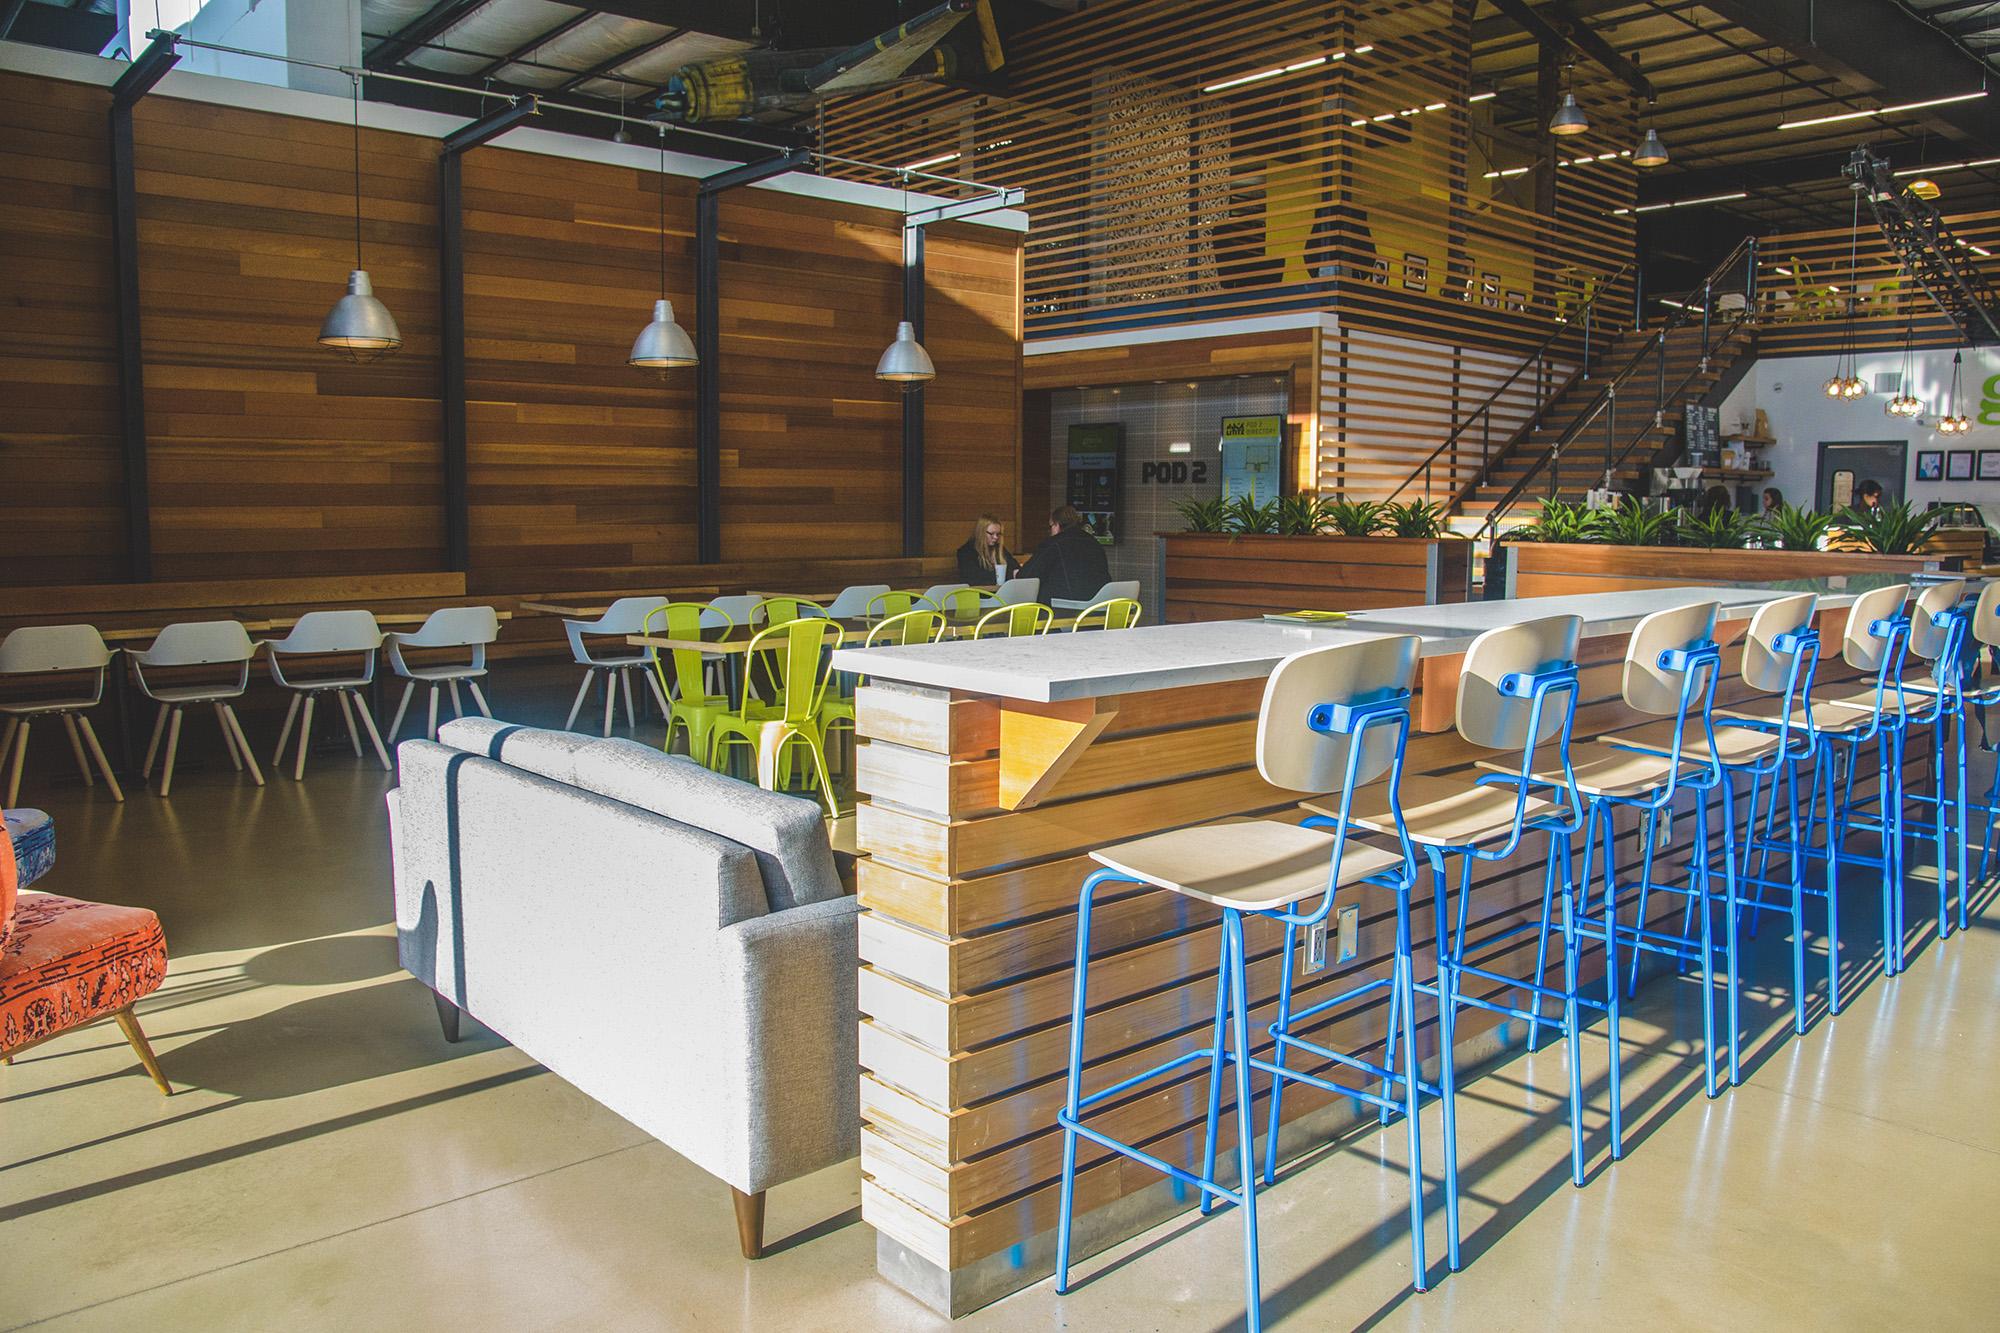 Gravie Kitchen + Commons interior